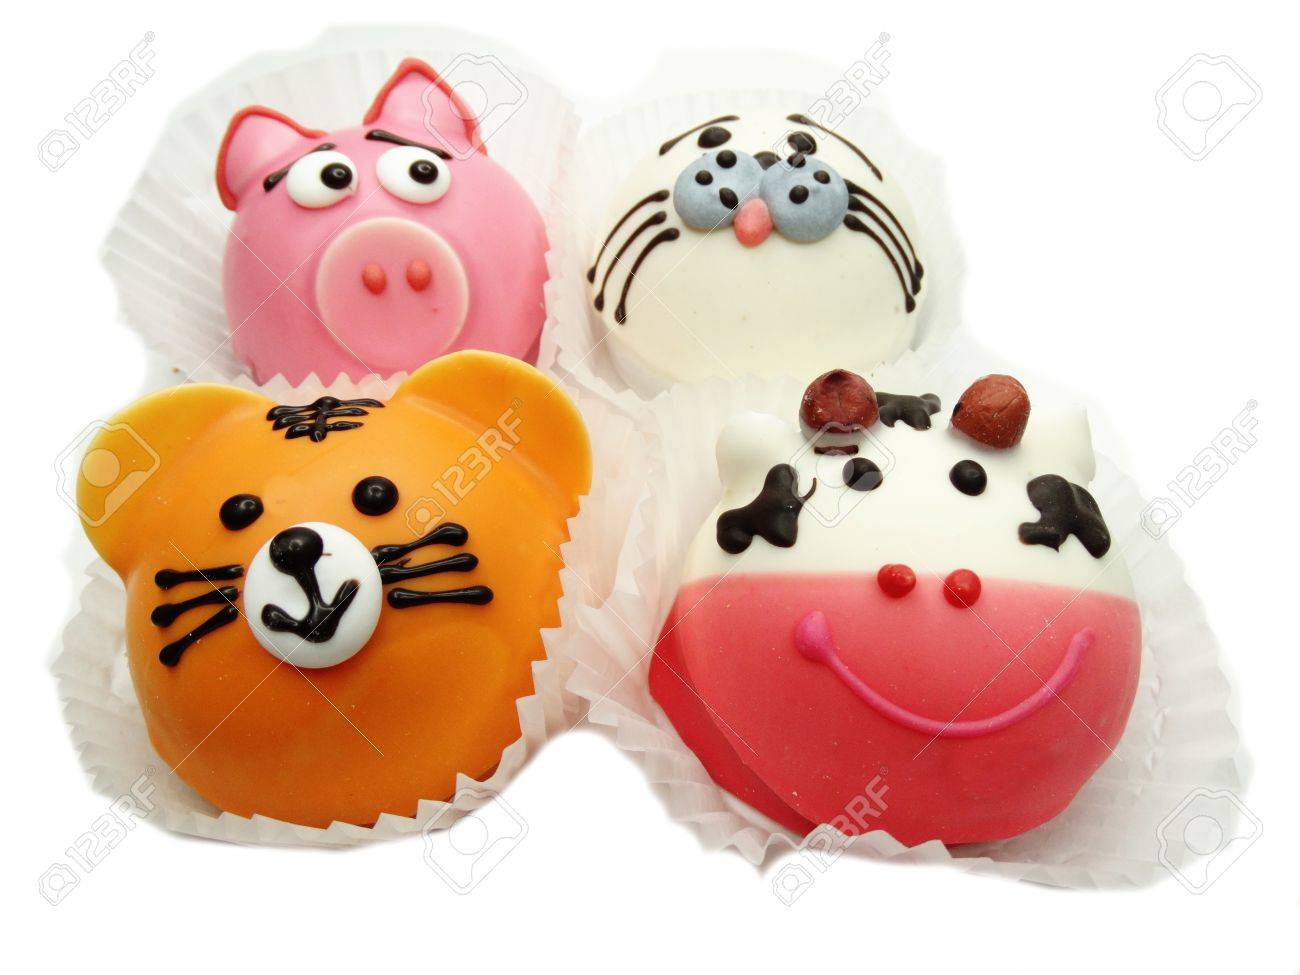 Kreative Geback Essen Kuchen Lustig Lustige Tiere Fur Kind